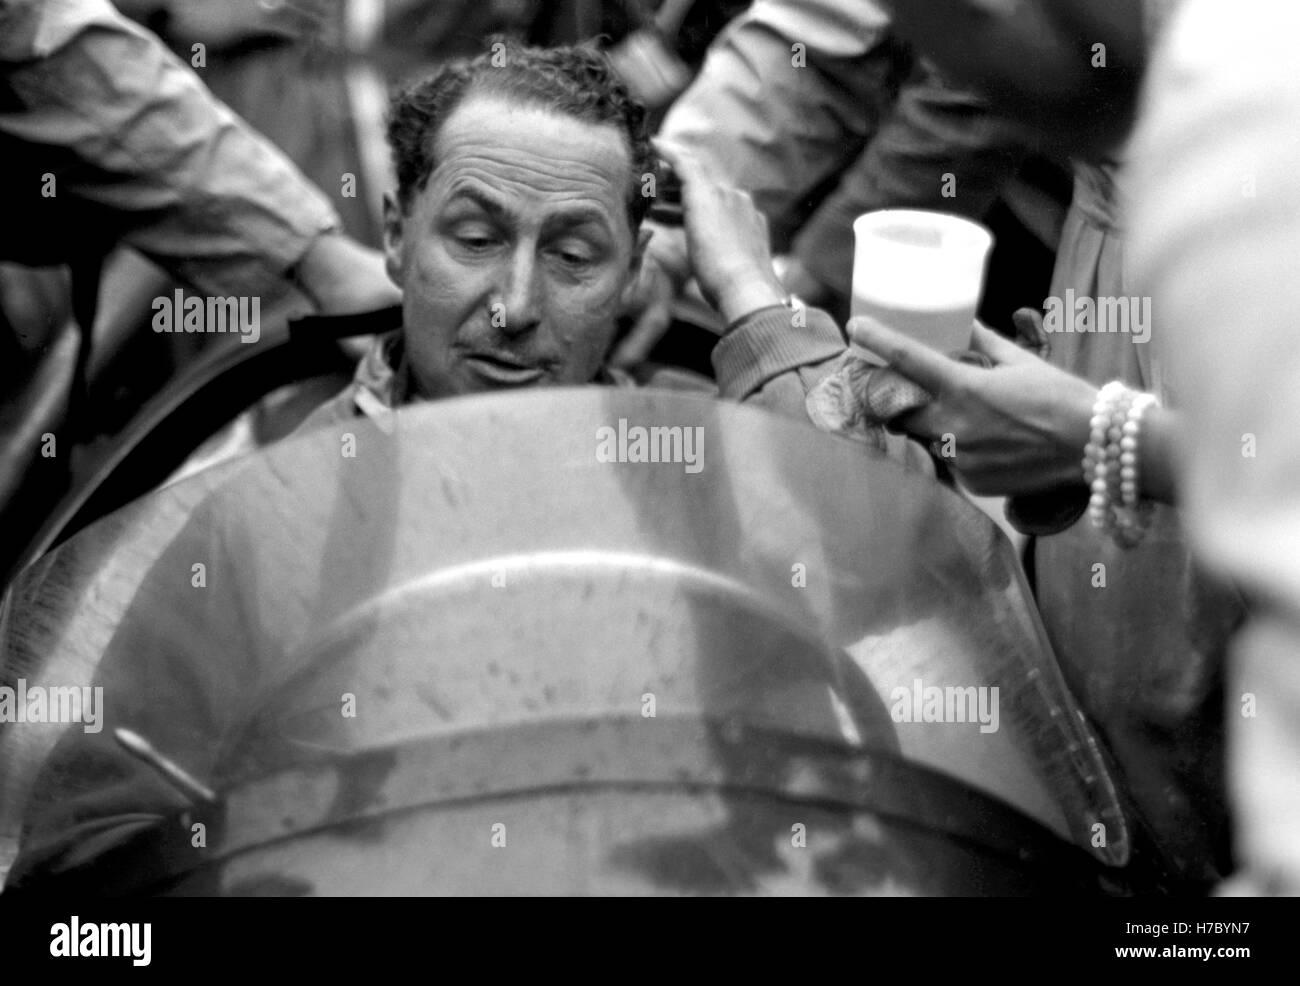 1956 Jack Fairman motor racing driver British GP Silverstone UK - Stock Image